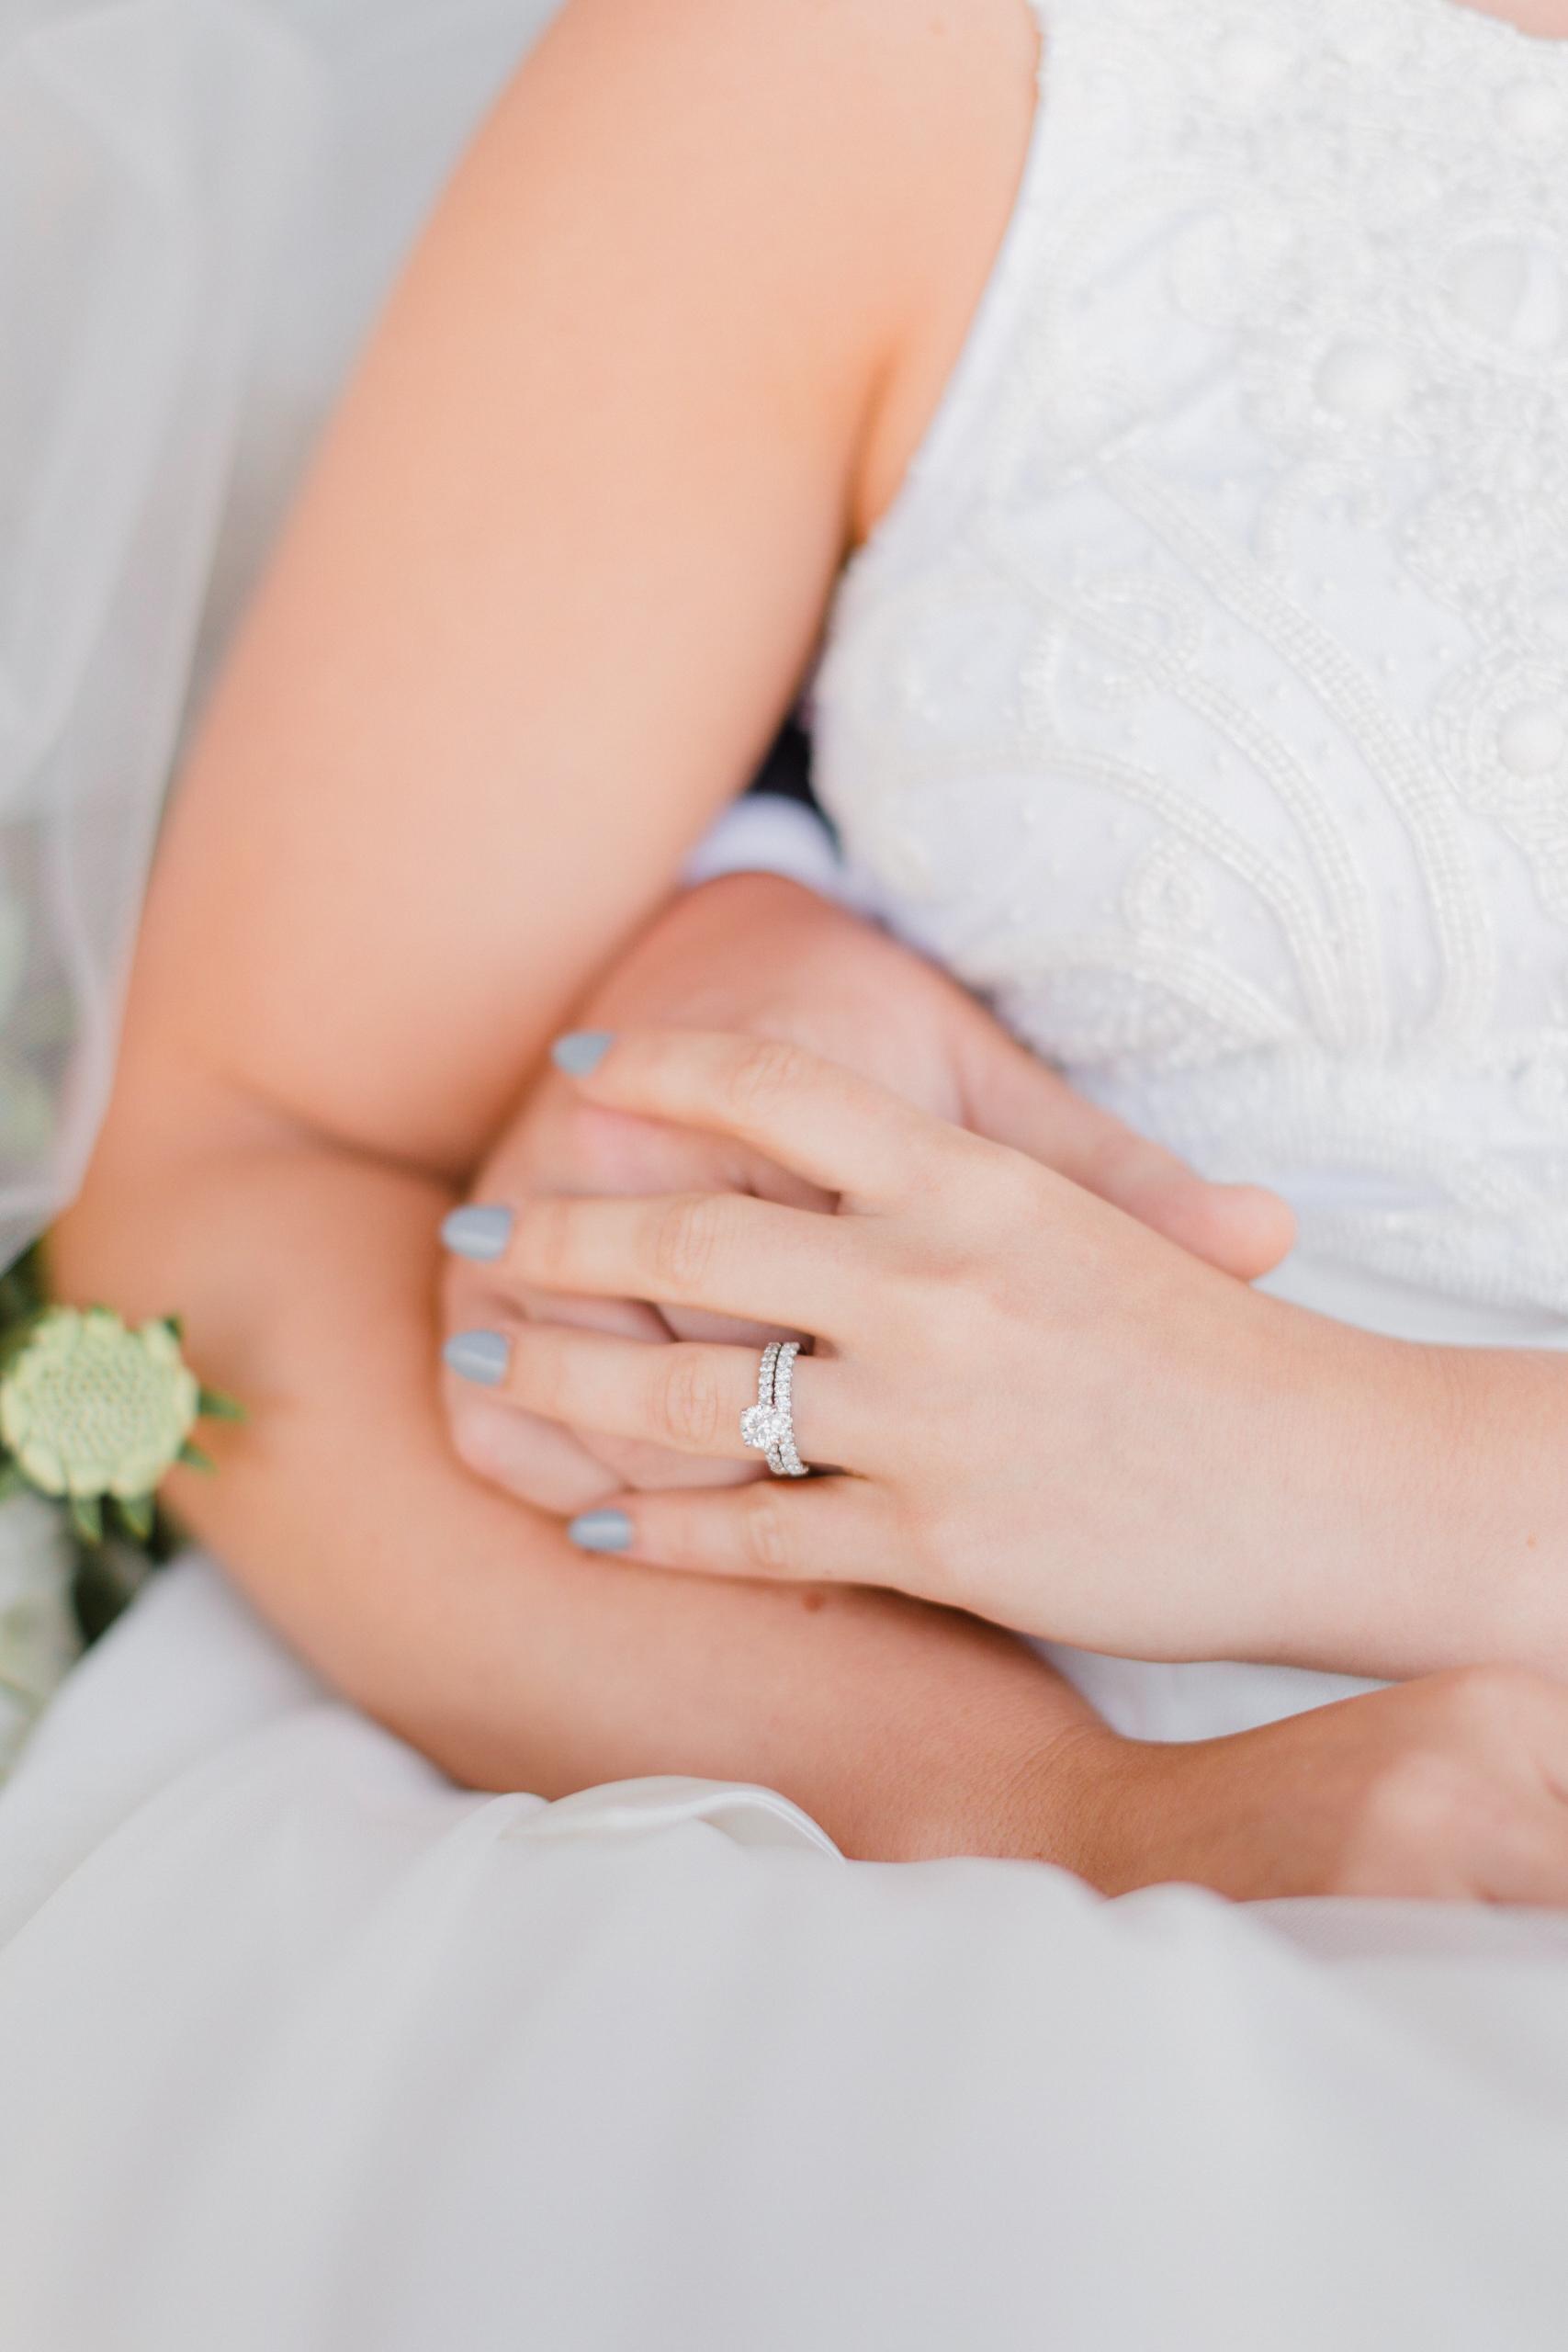 Rustic Wedding Decor - Raspberry Ridge Golf Course Wedding — The Overwhelmed Bride Wedding BlogRustic Wedding Decor - Raspberry Ridge Golf Course Wedding — The Overwhelmed Bride Wedding Blog